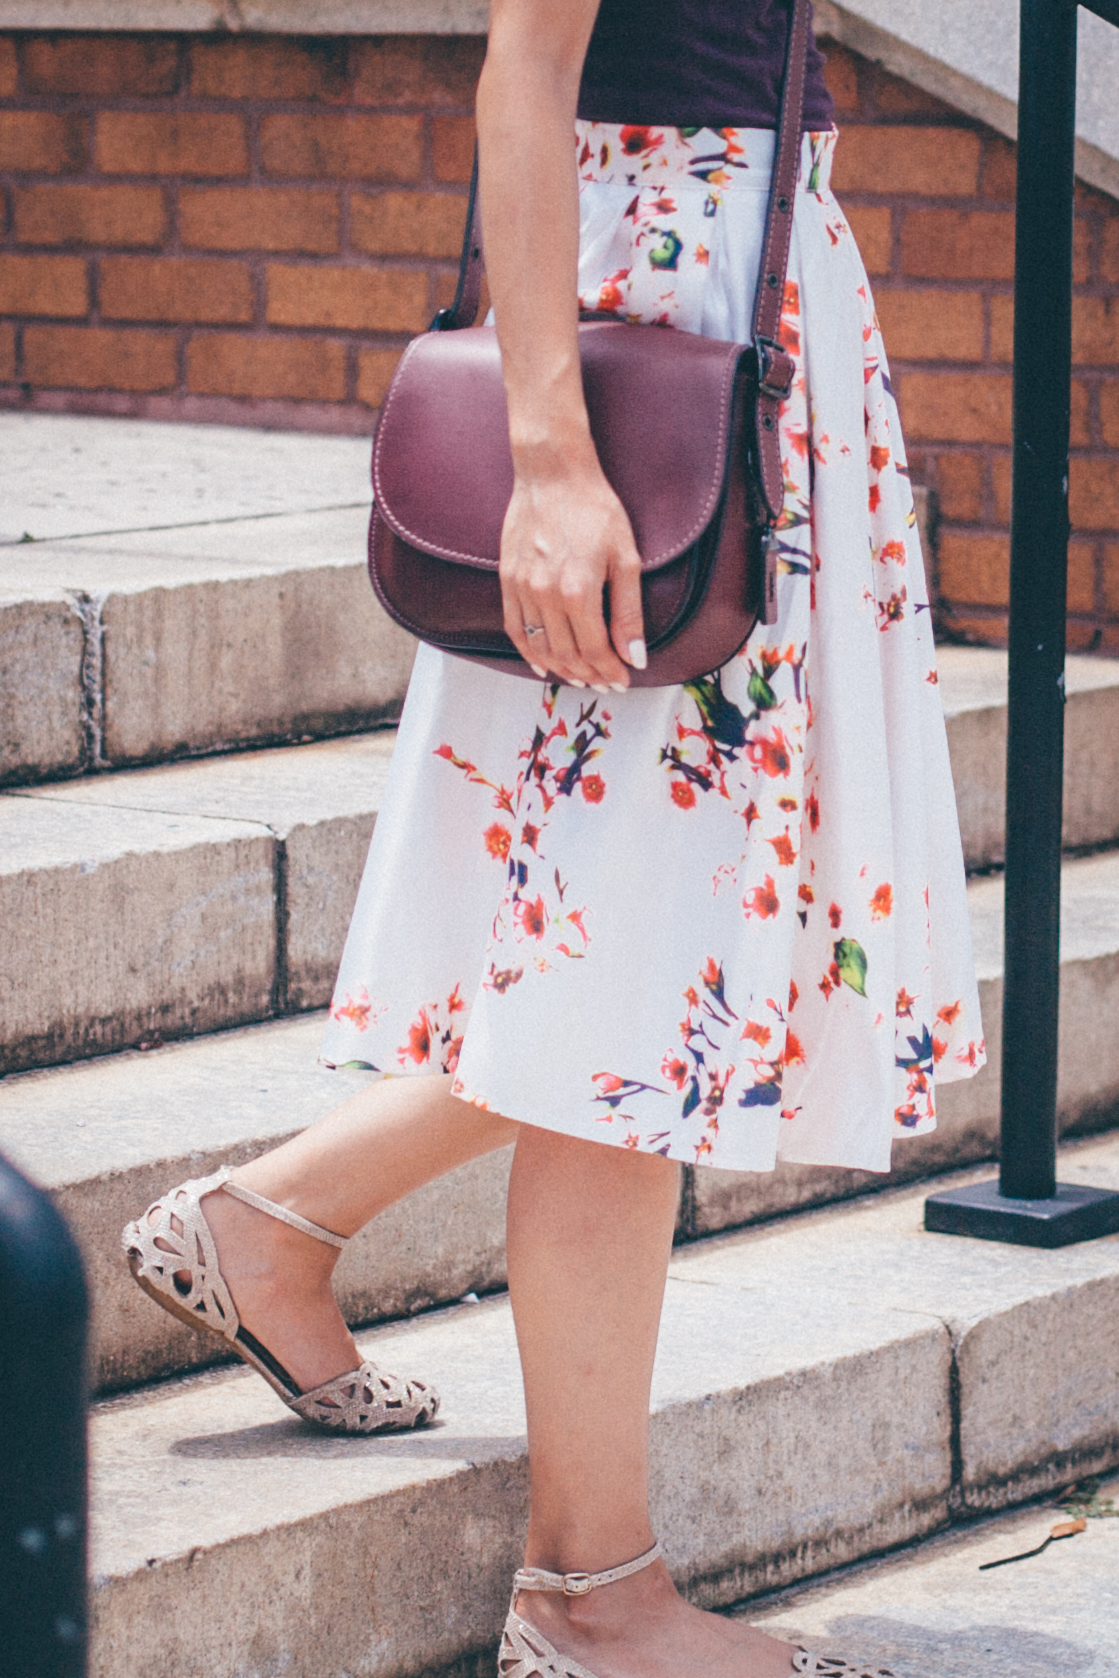 This Jenn Girl - Shein Floral Skirt 2